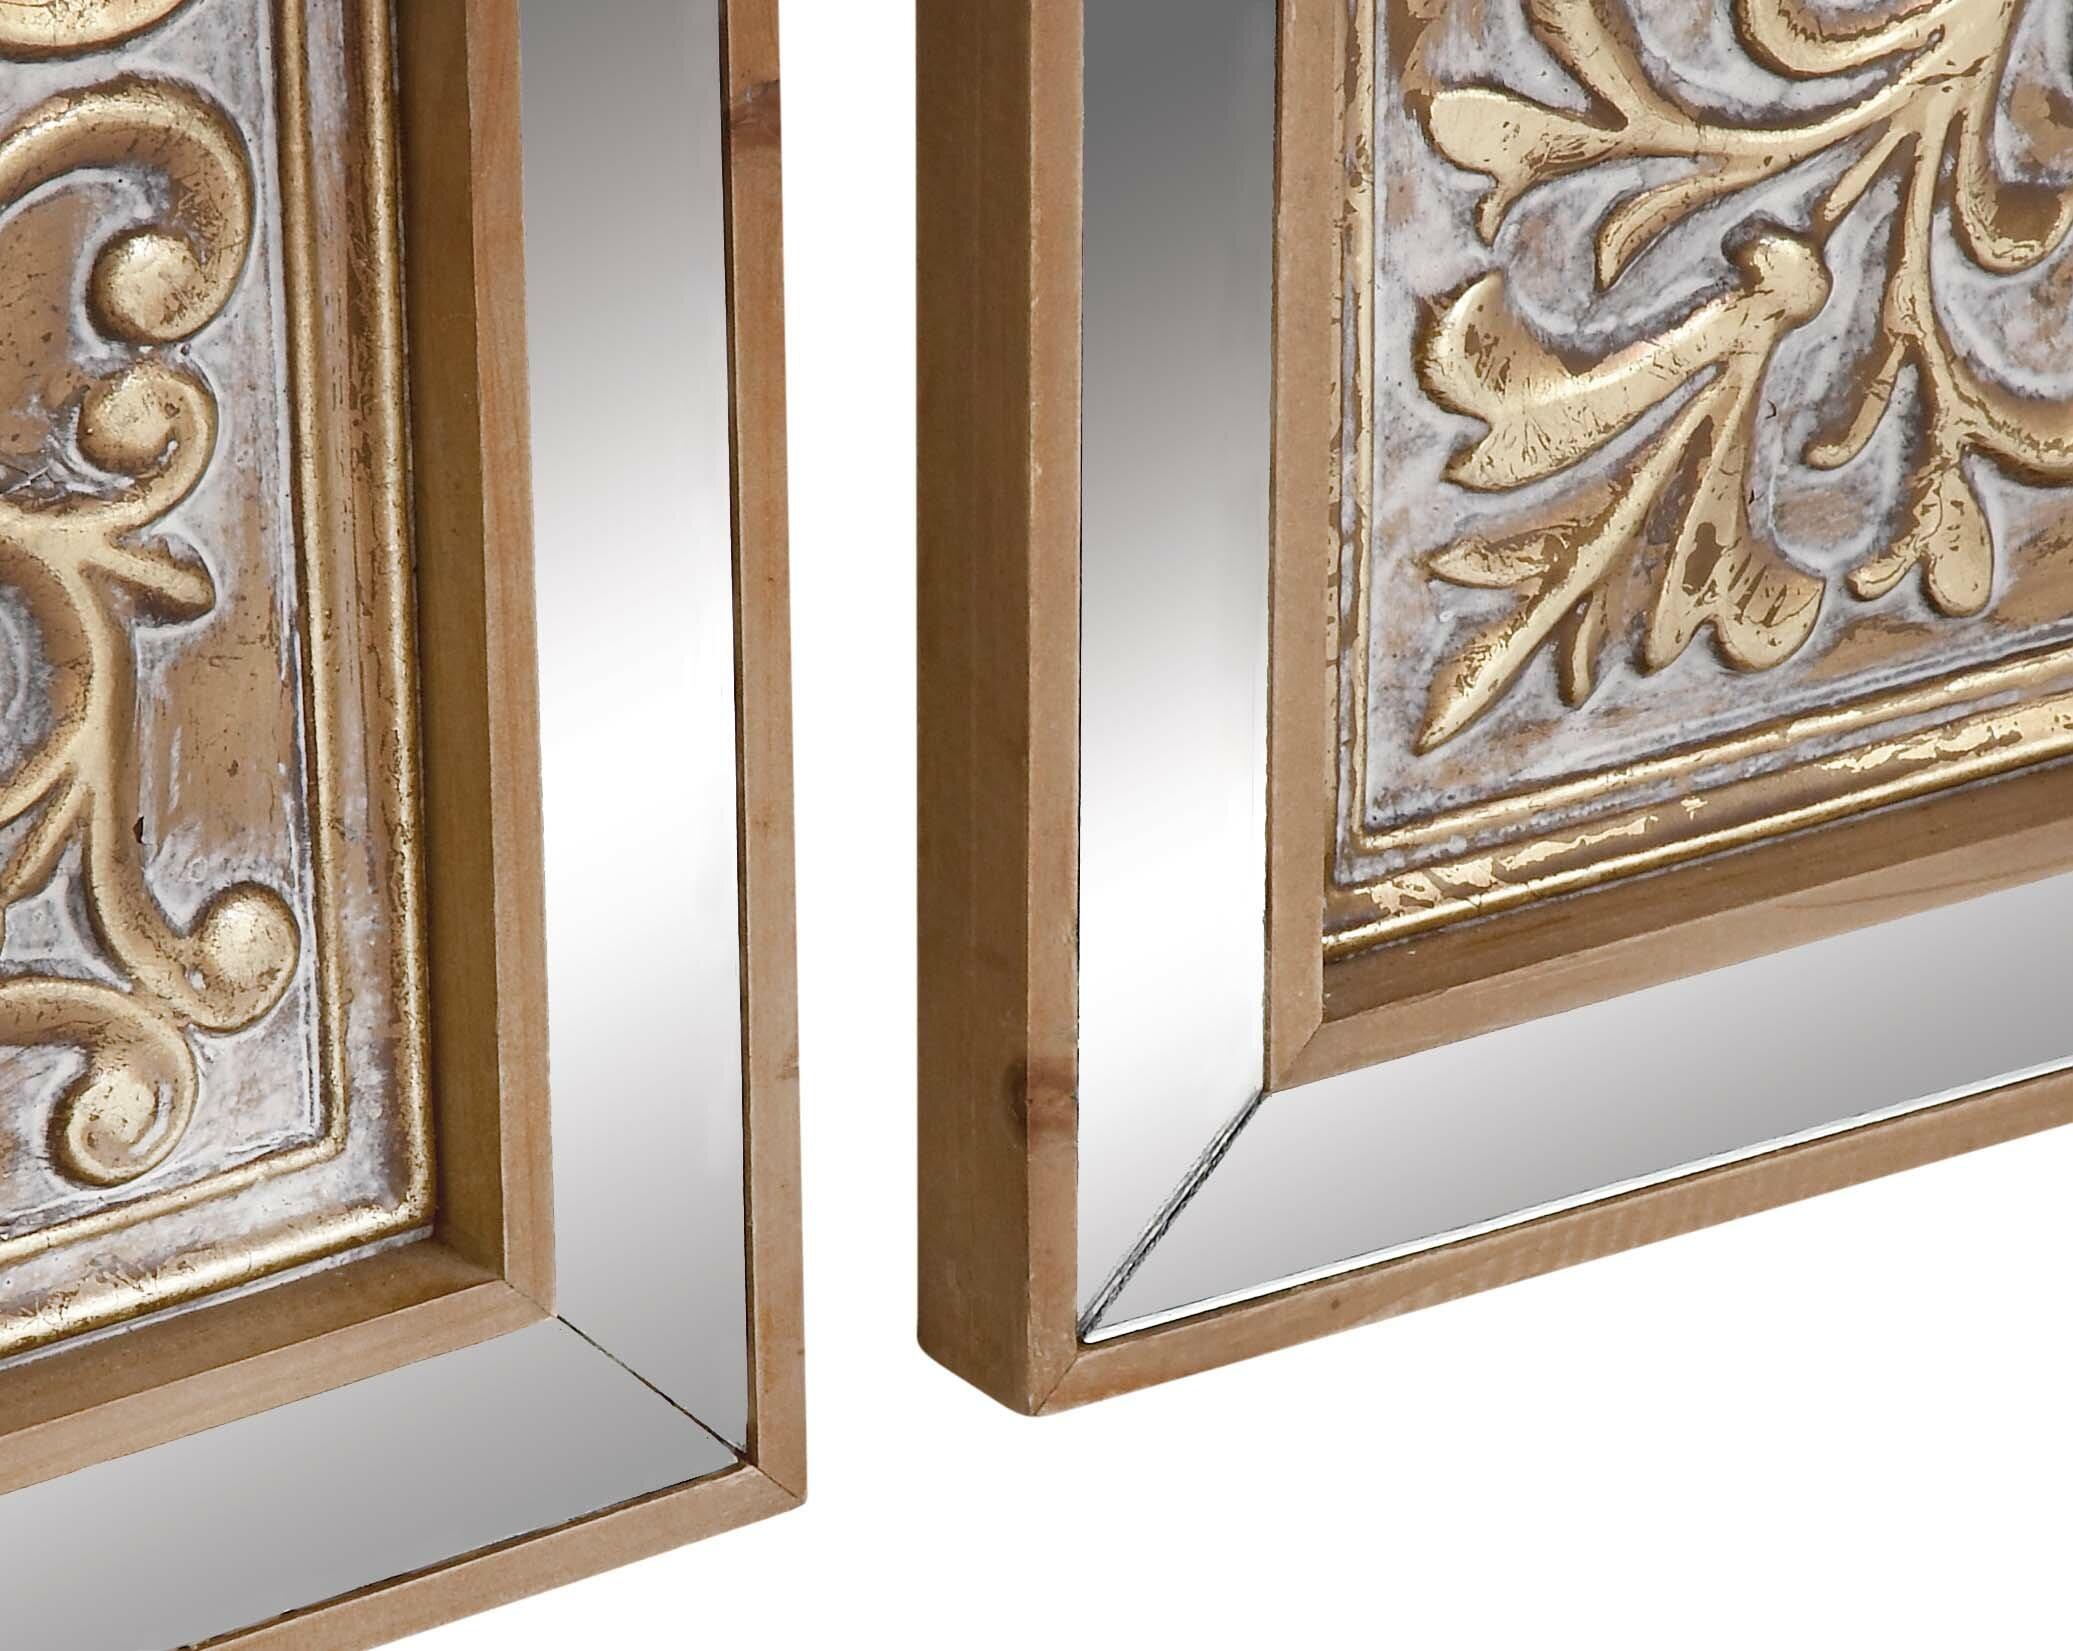 3 piece metal mirror plaque wall décor set reviews joss main